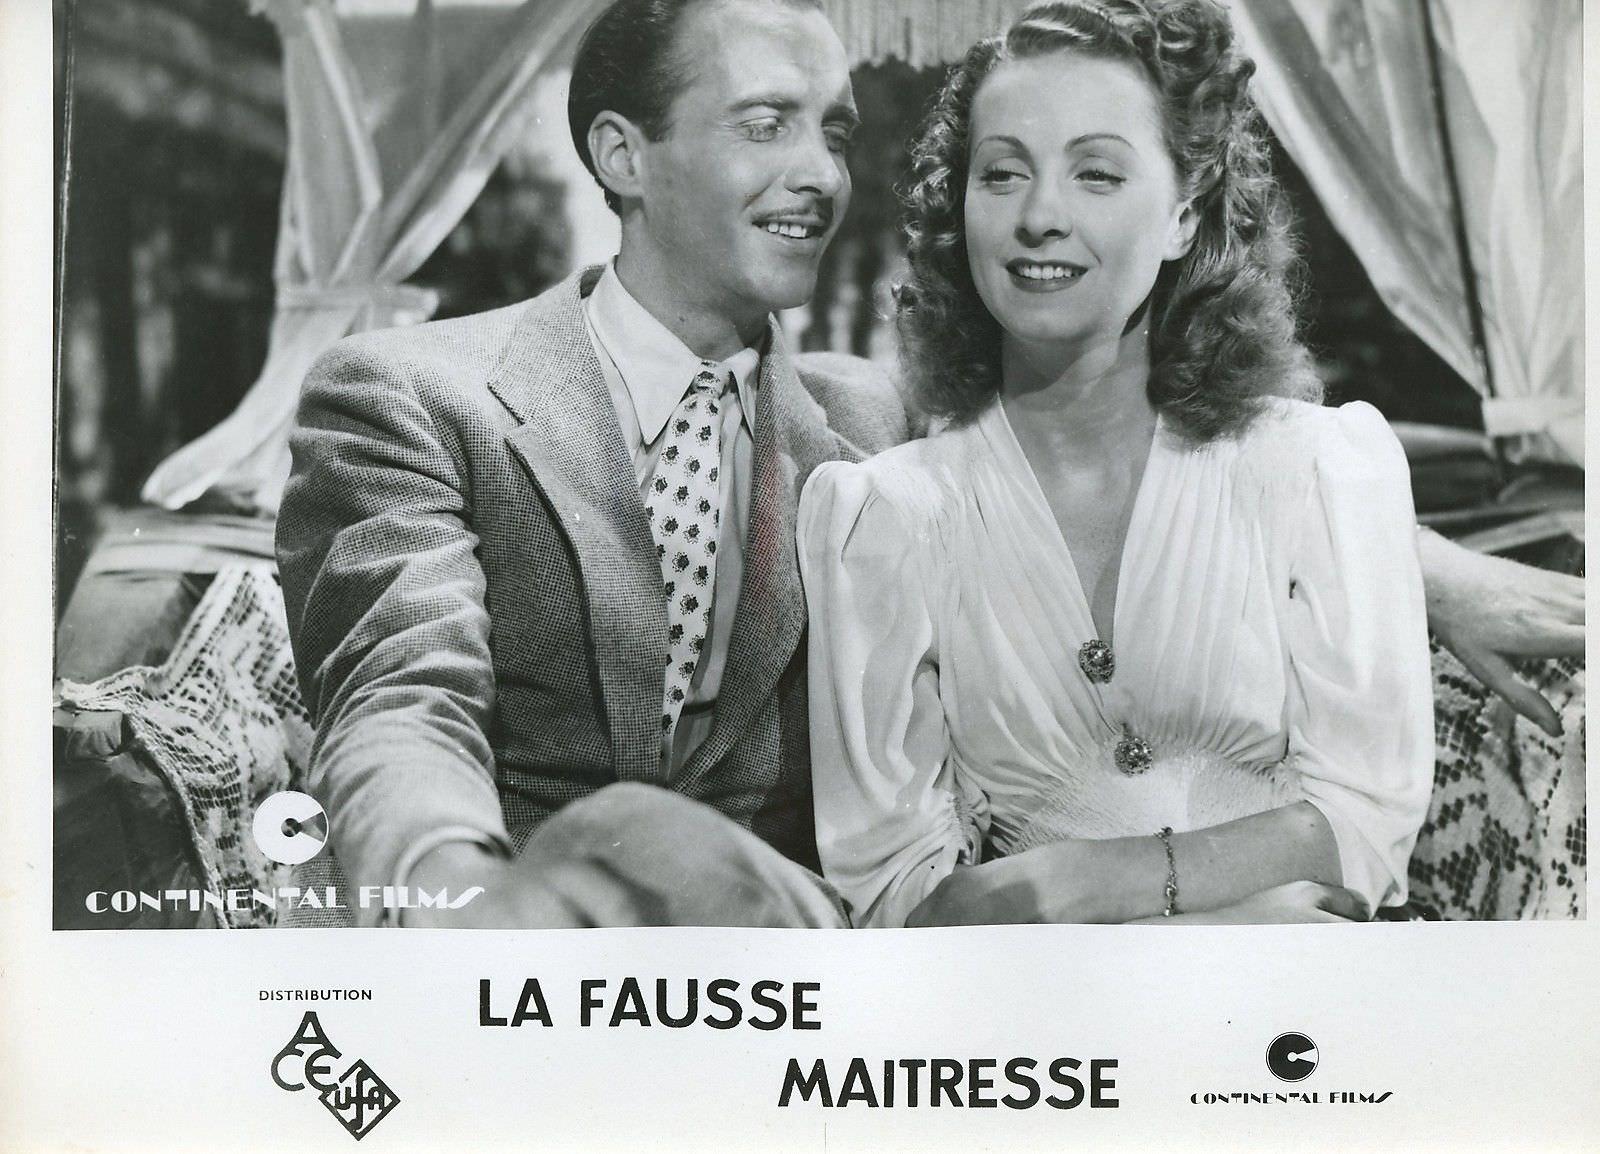 Danielle Darrieux and Bernard Lancret in La fausse maîtresse (1942)